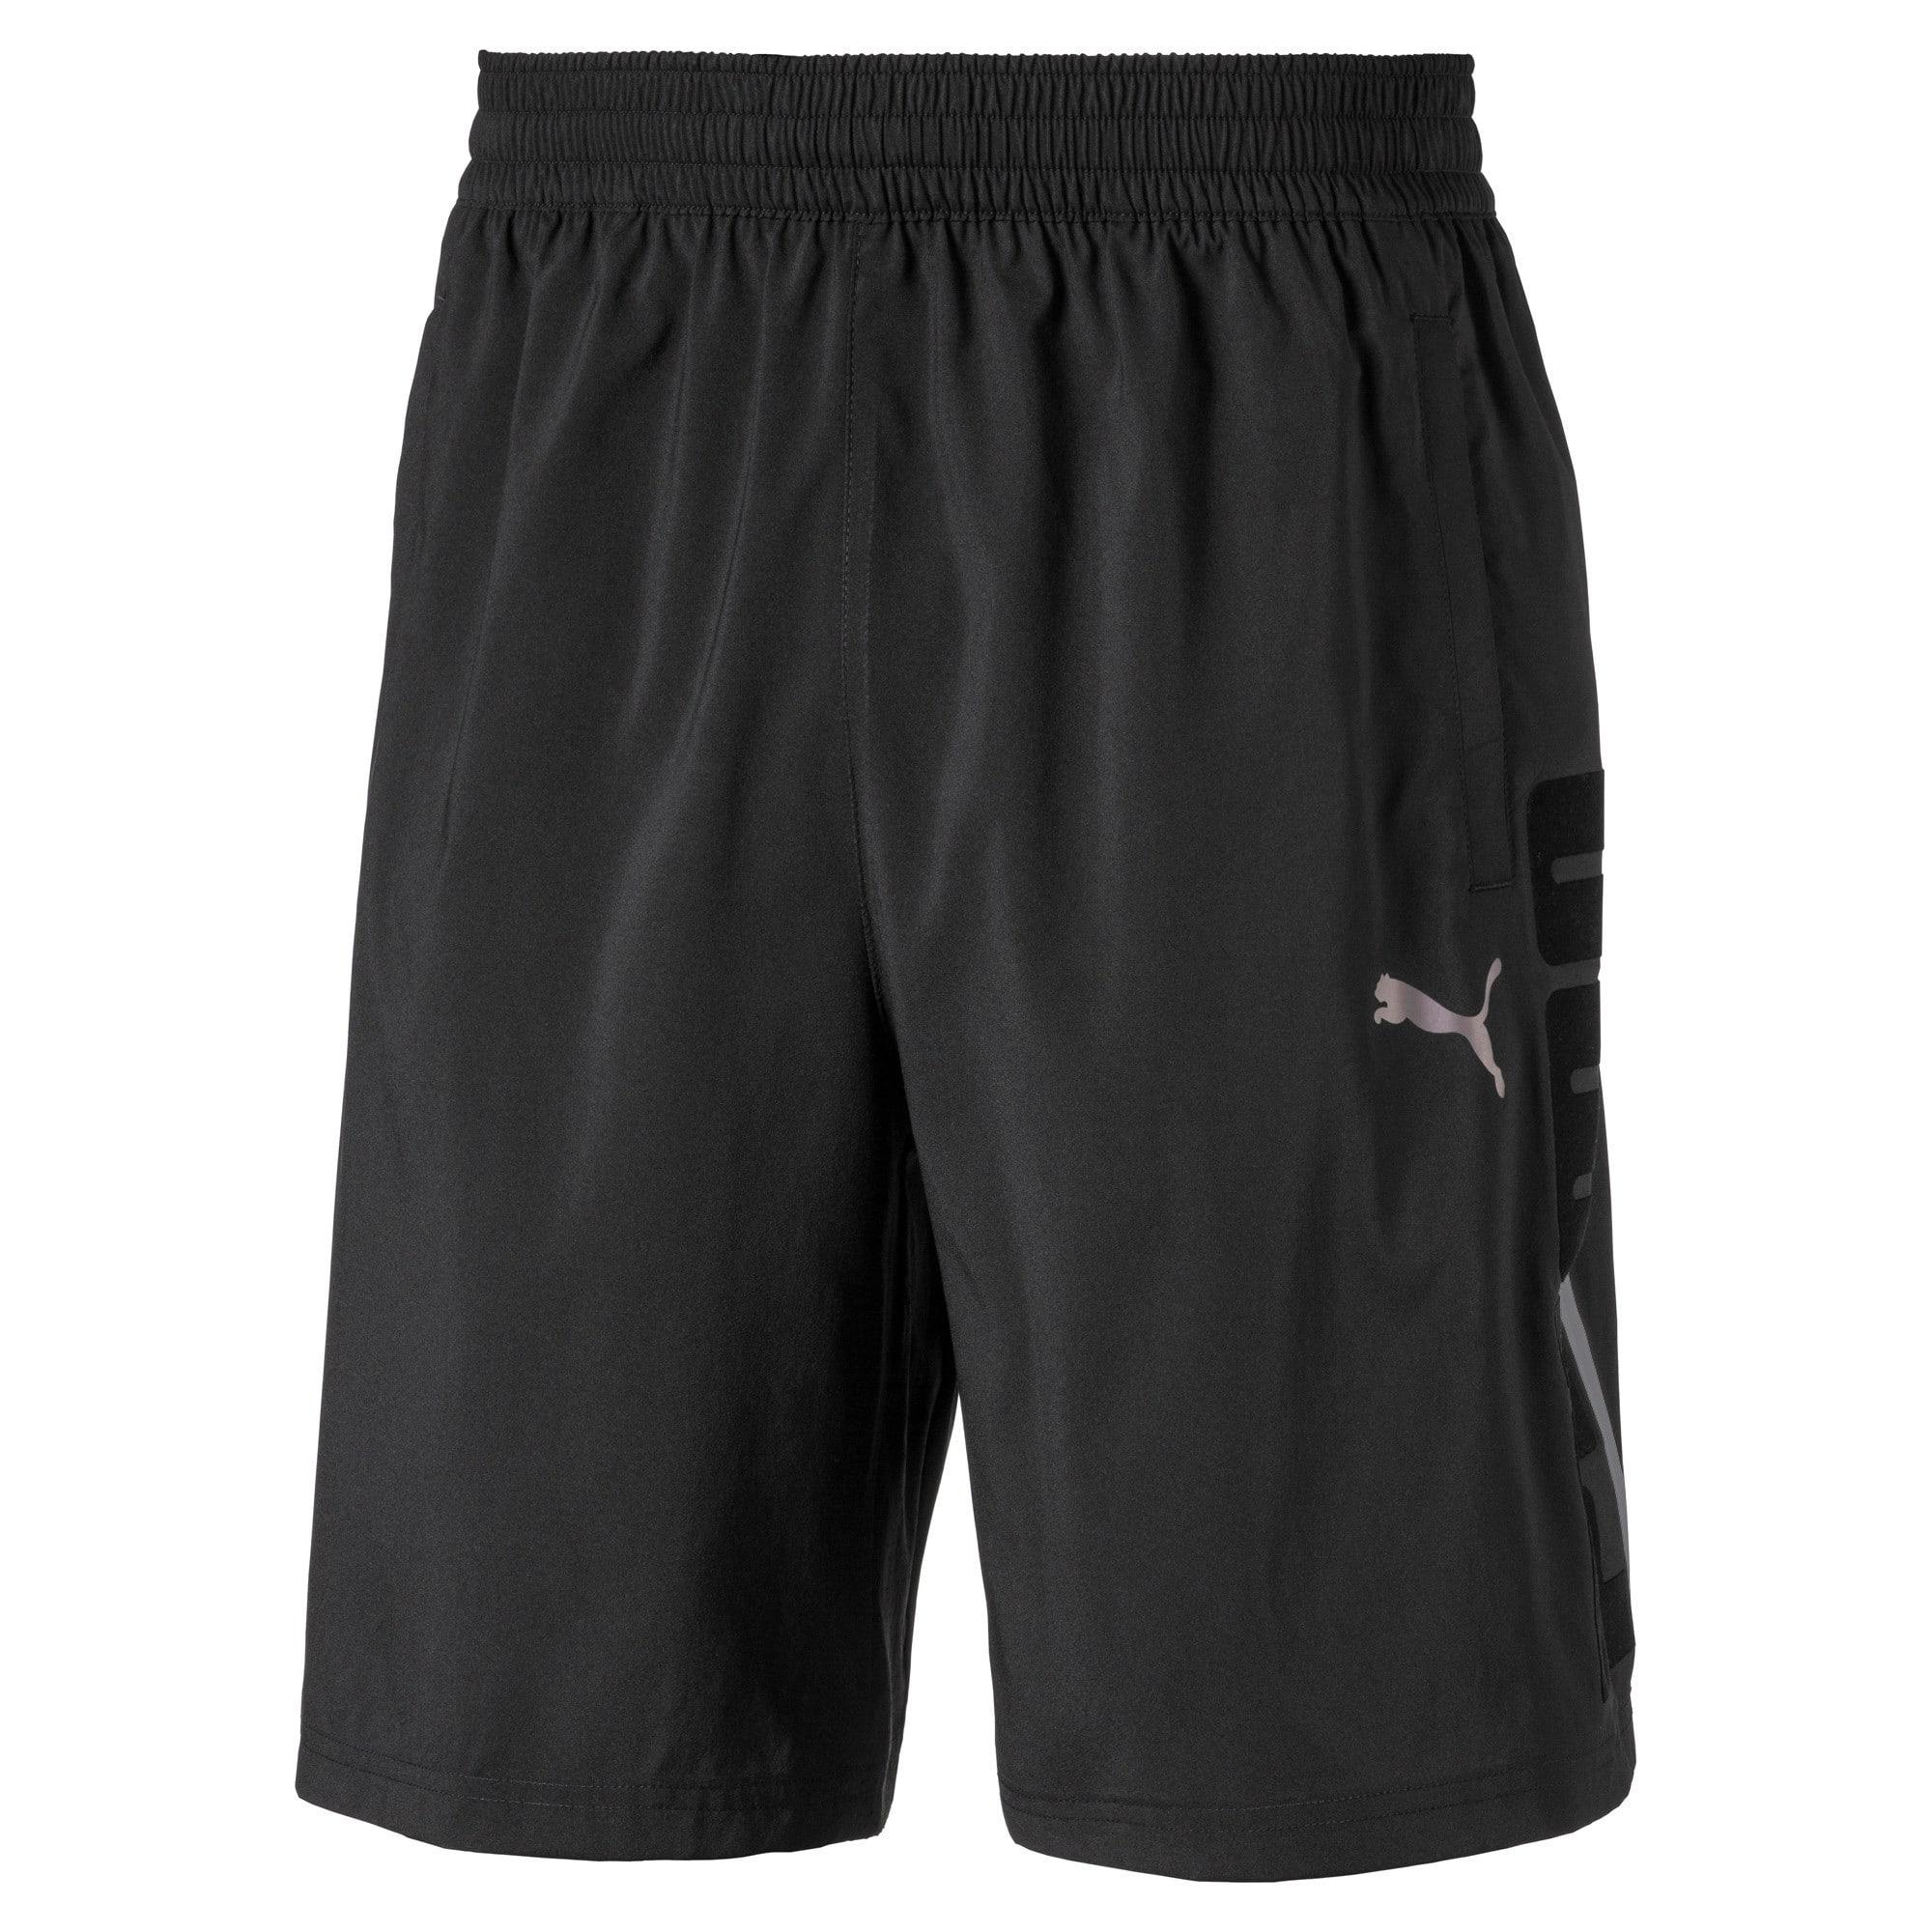 Thumbnail 4 of Power BND Men's Shorts, Puma Black, medium